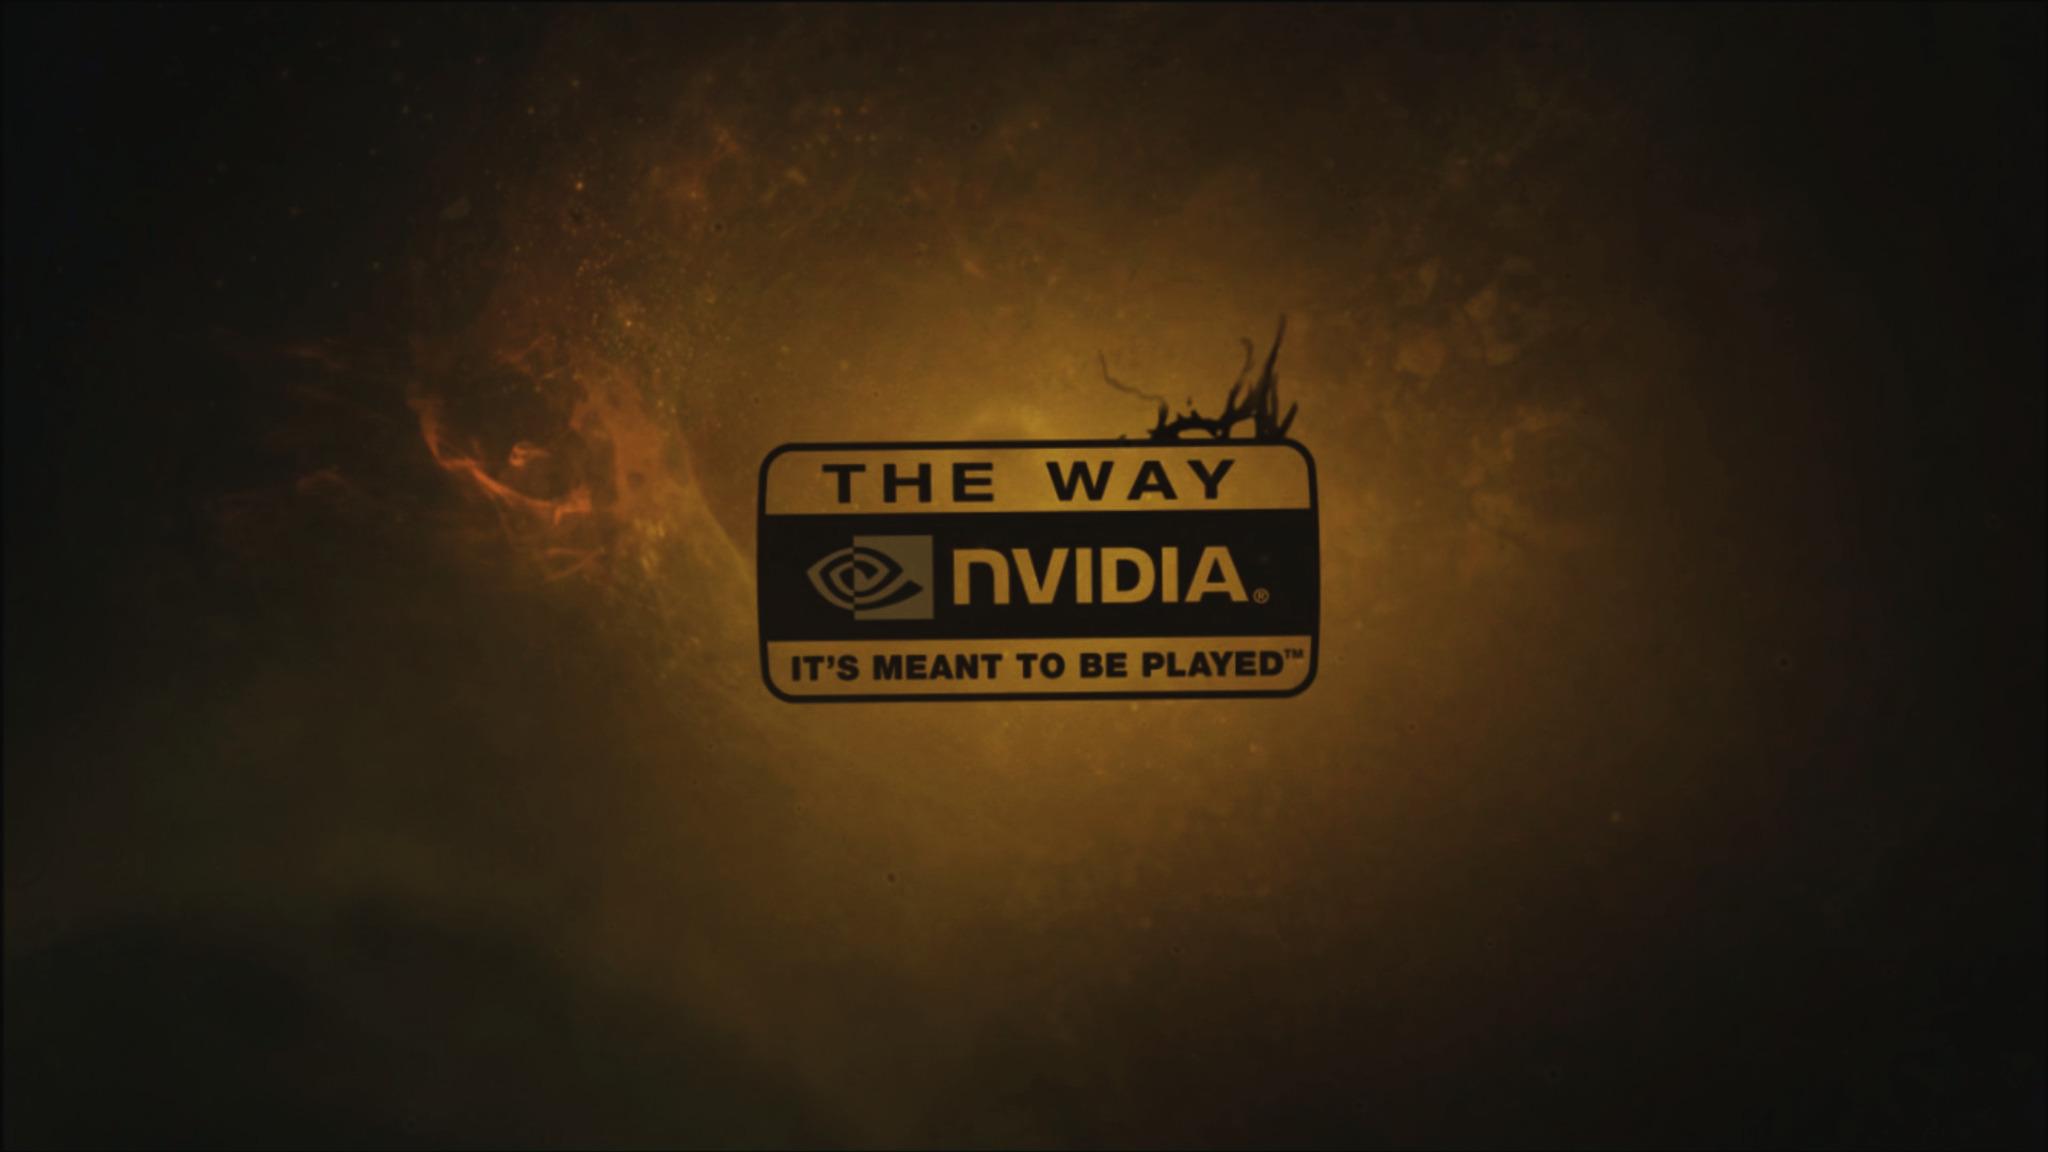 2048x1152 Nvidia Gaming Resolution HD 4k Wallpapers